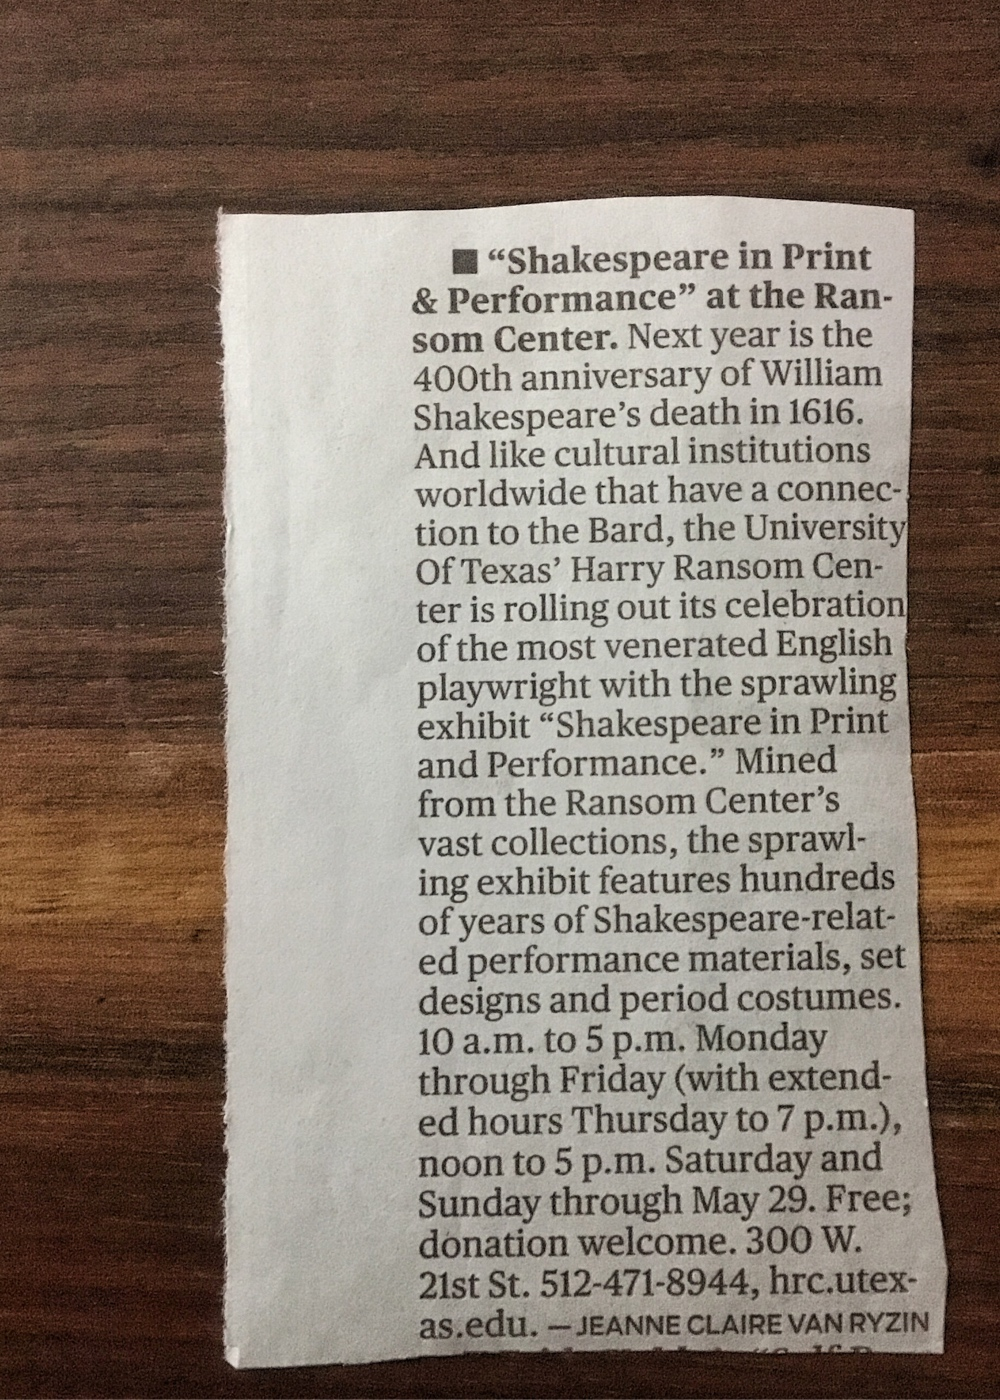 Shakespeare at UT